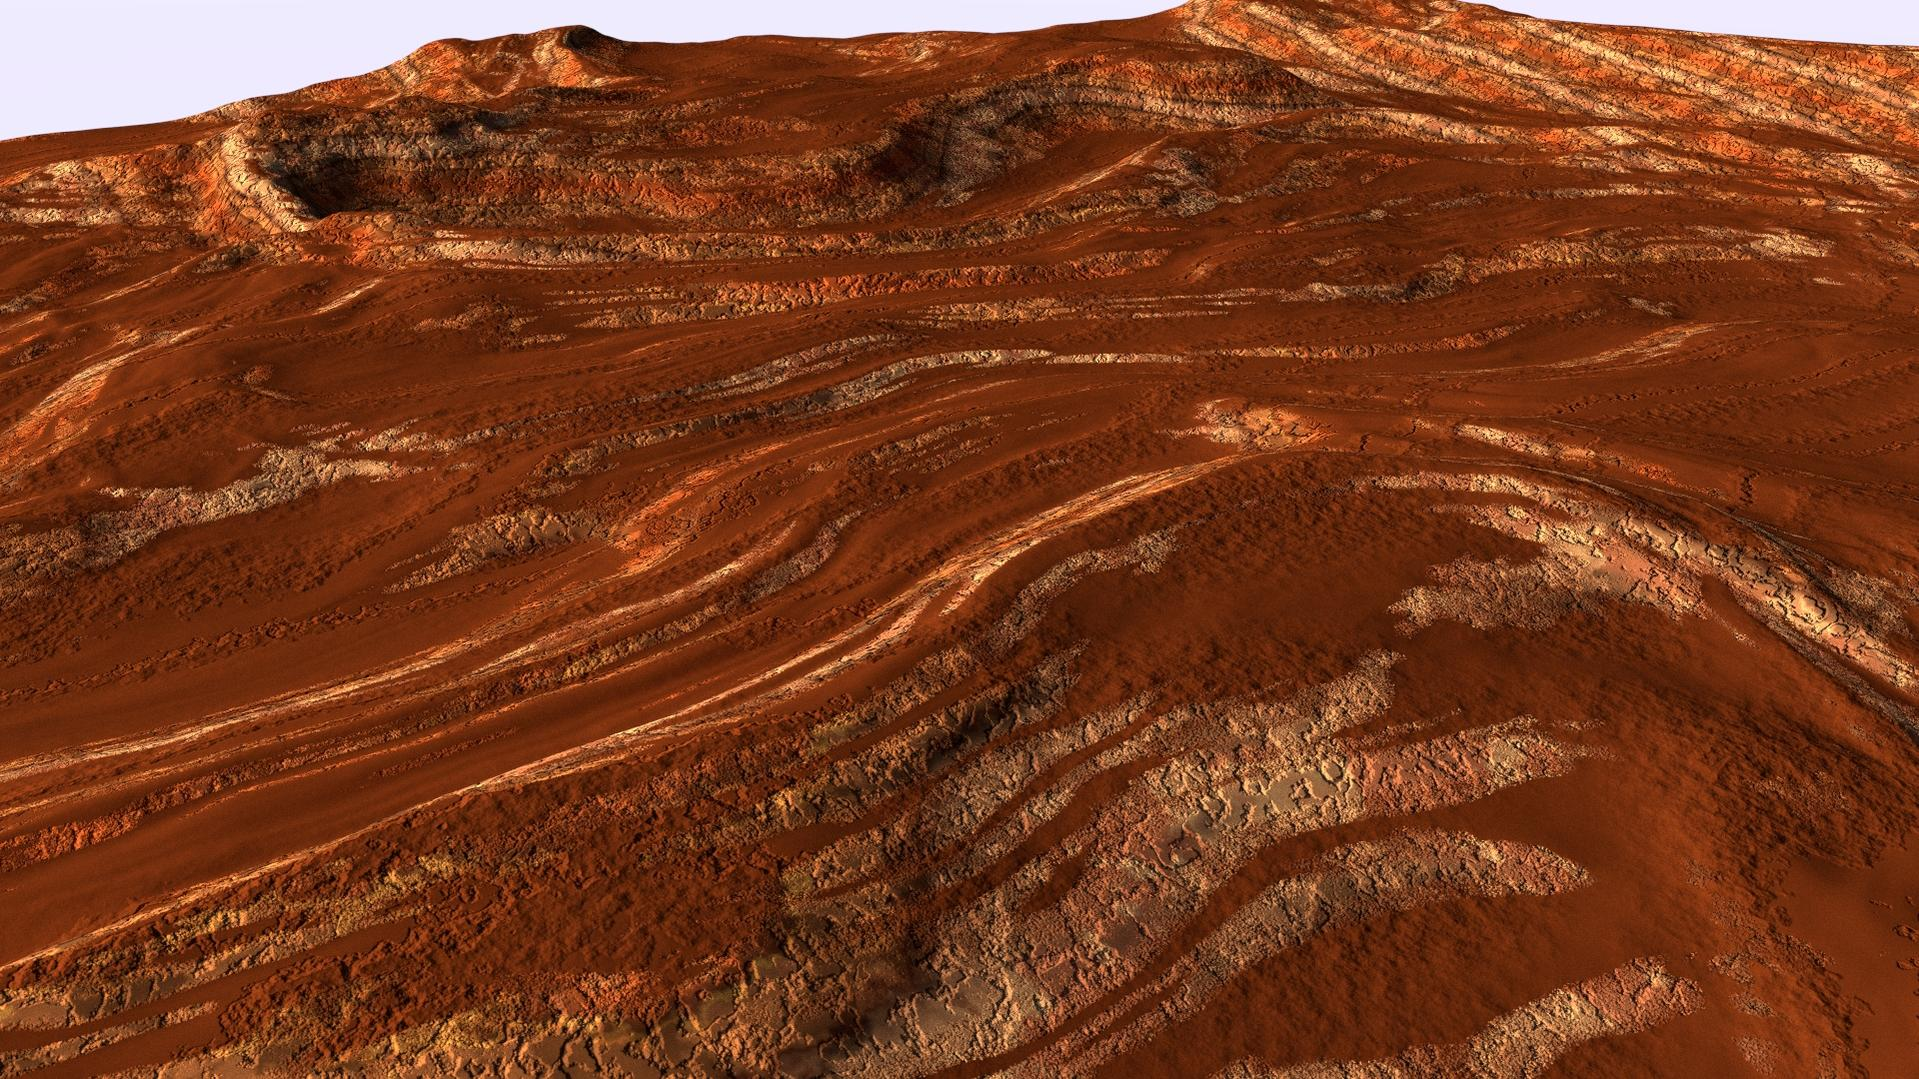 Procedural terrain texture - Cycles - Focused Critiques